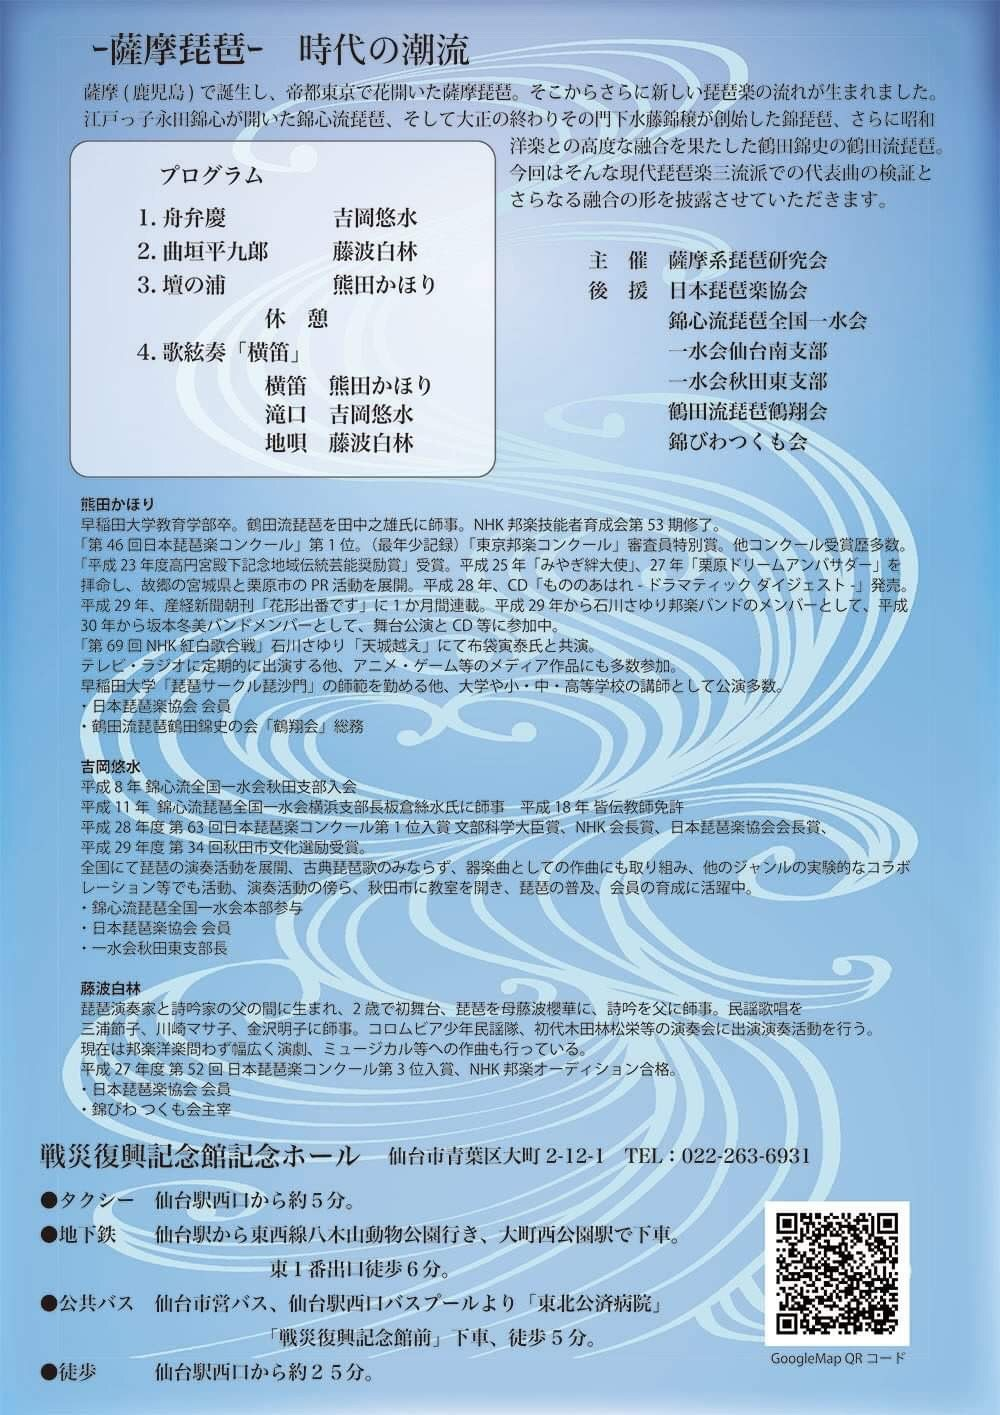 -薩摩琵琶-時代の潮流 【2019年10月14日】=終了=_c0366731_23445498.jpeg